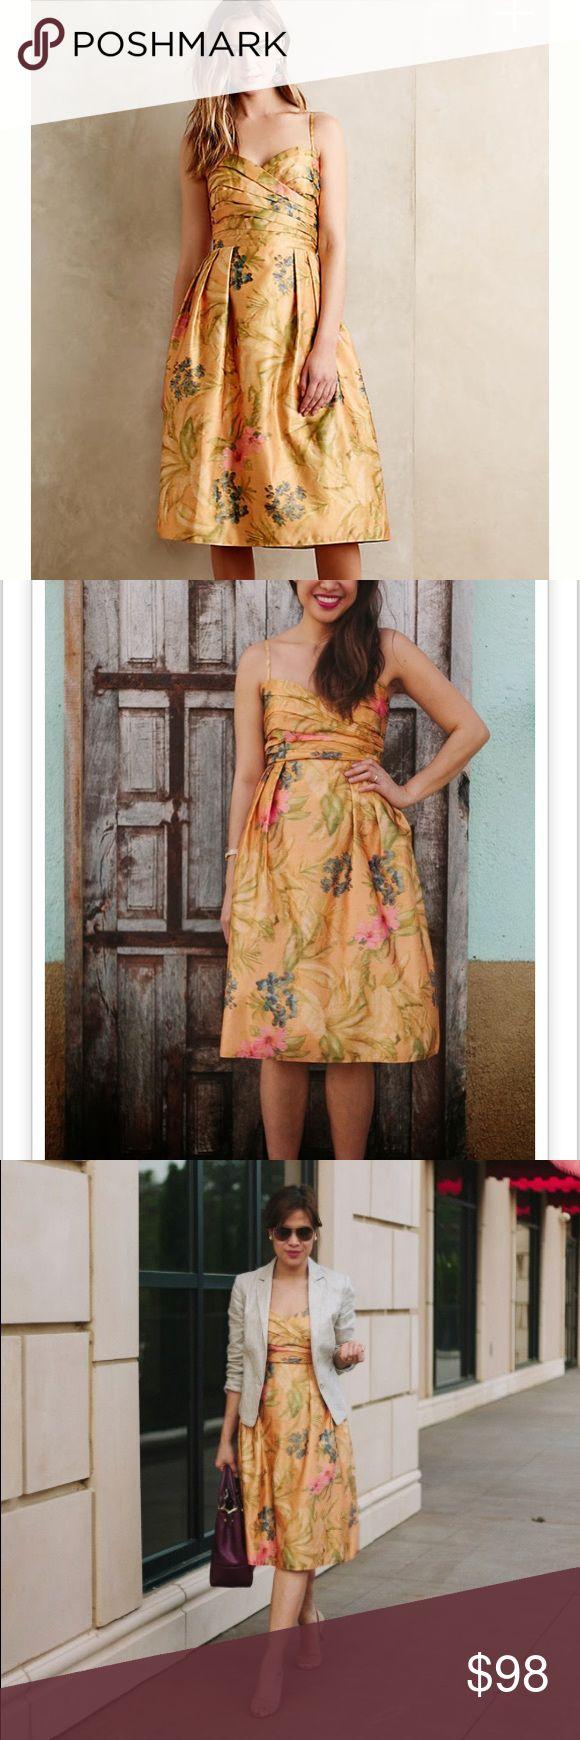 Anthro James Coviello Botanica Dress Imbued with New York